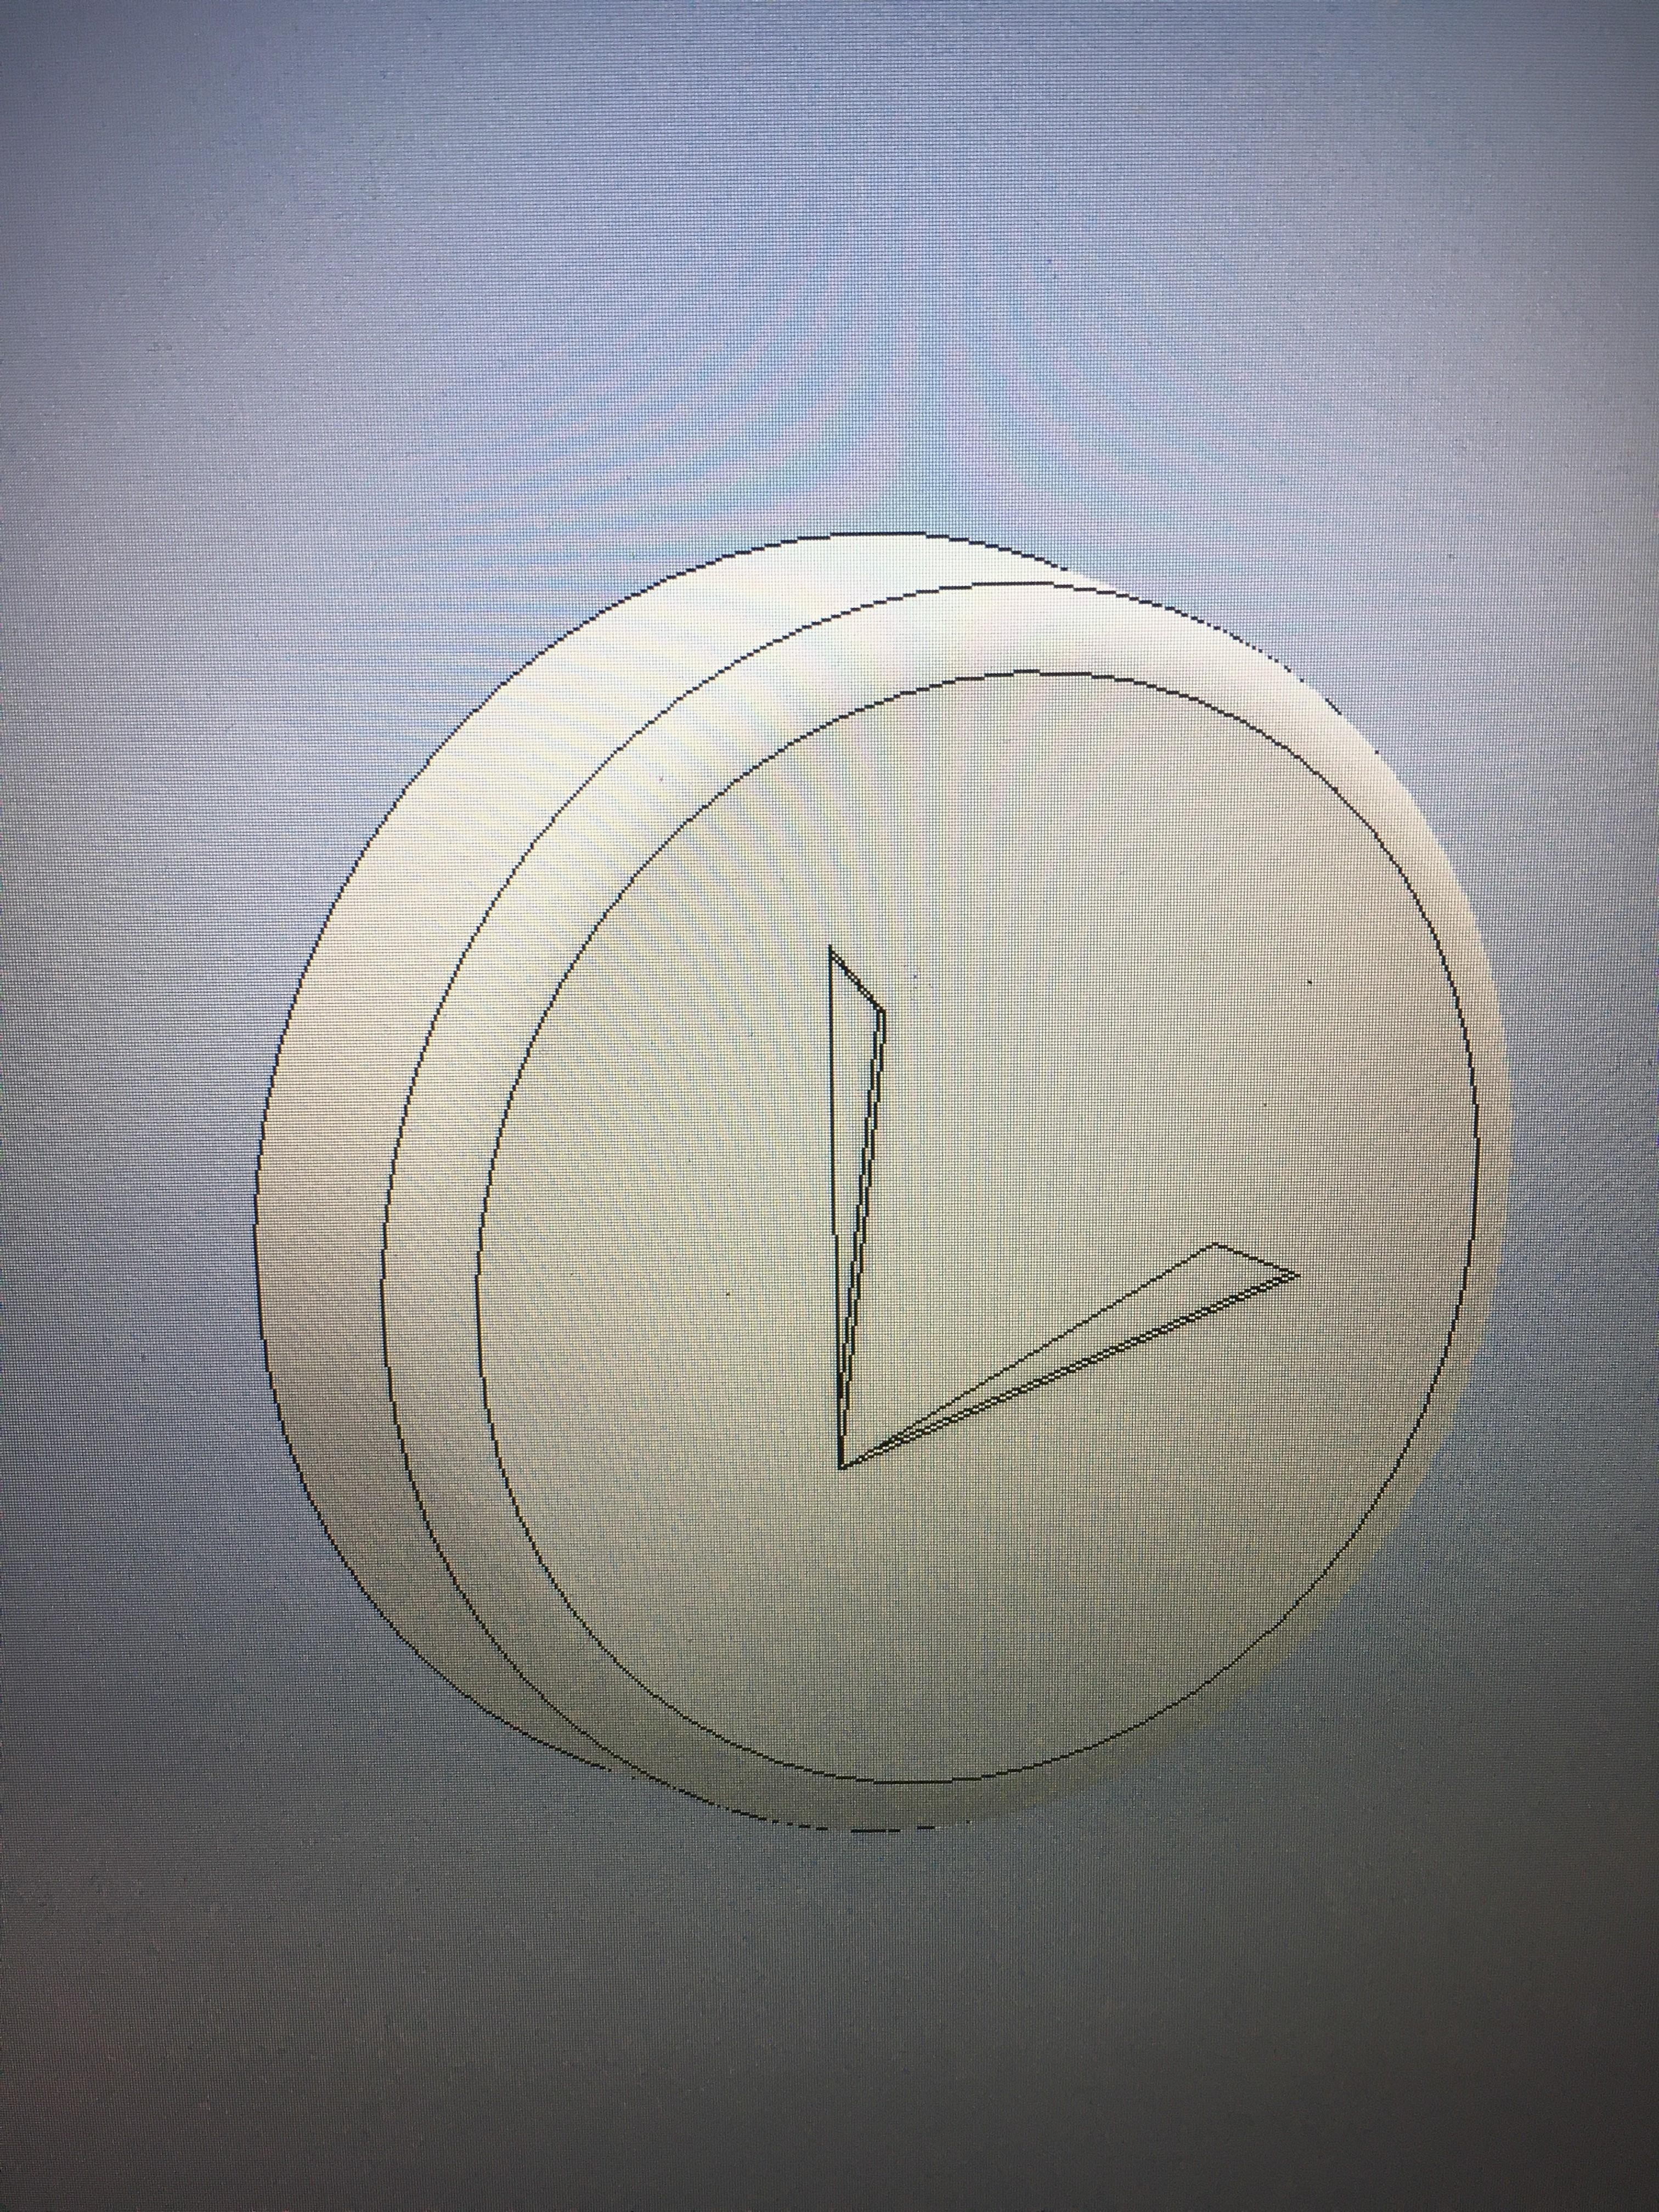 IMG_0220.JPG Download free STL file Prius Climate control knob cap • 3D print design, turnerw006